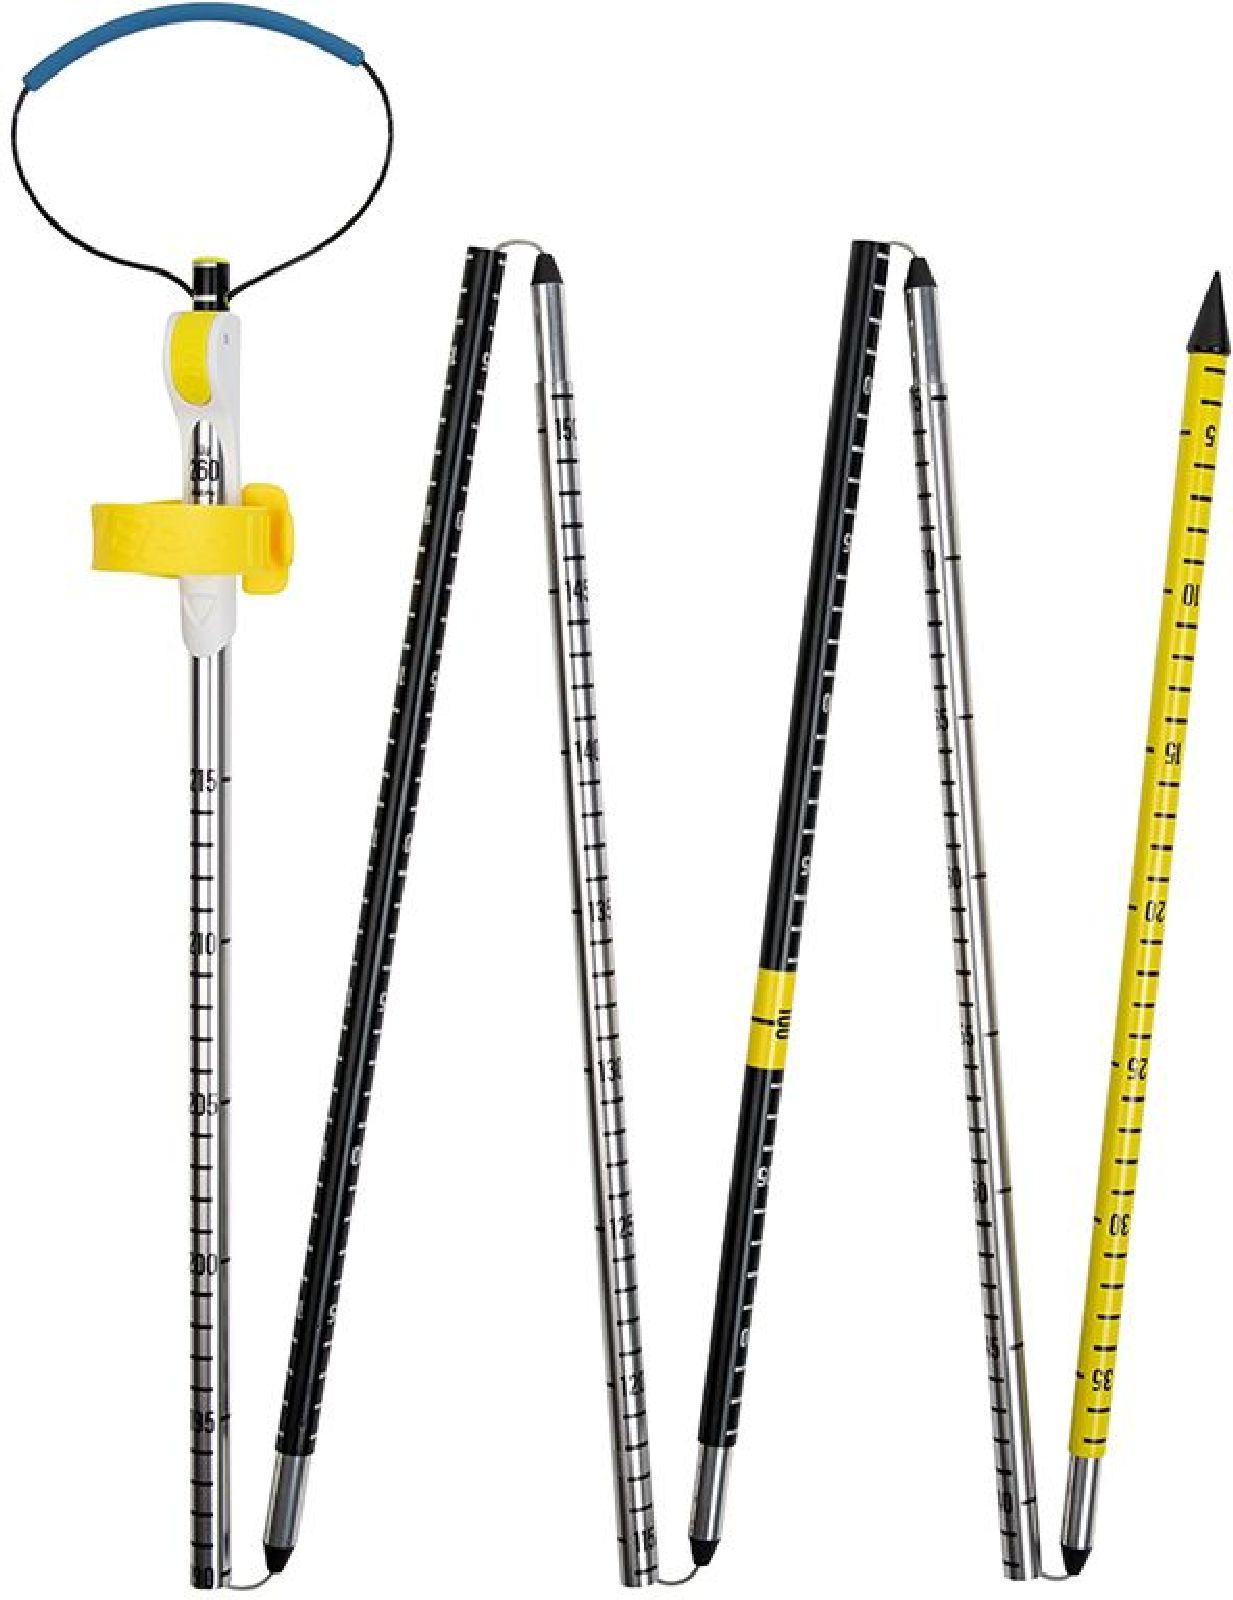 Pieps Probe Alu 260 Sport - black/silver/yellow uni